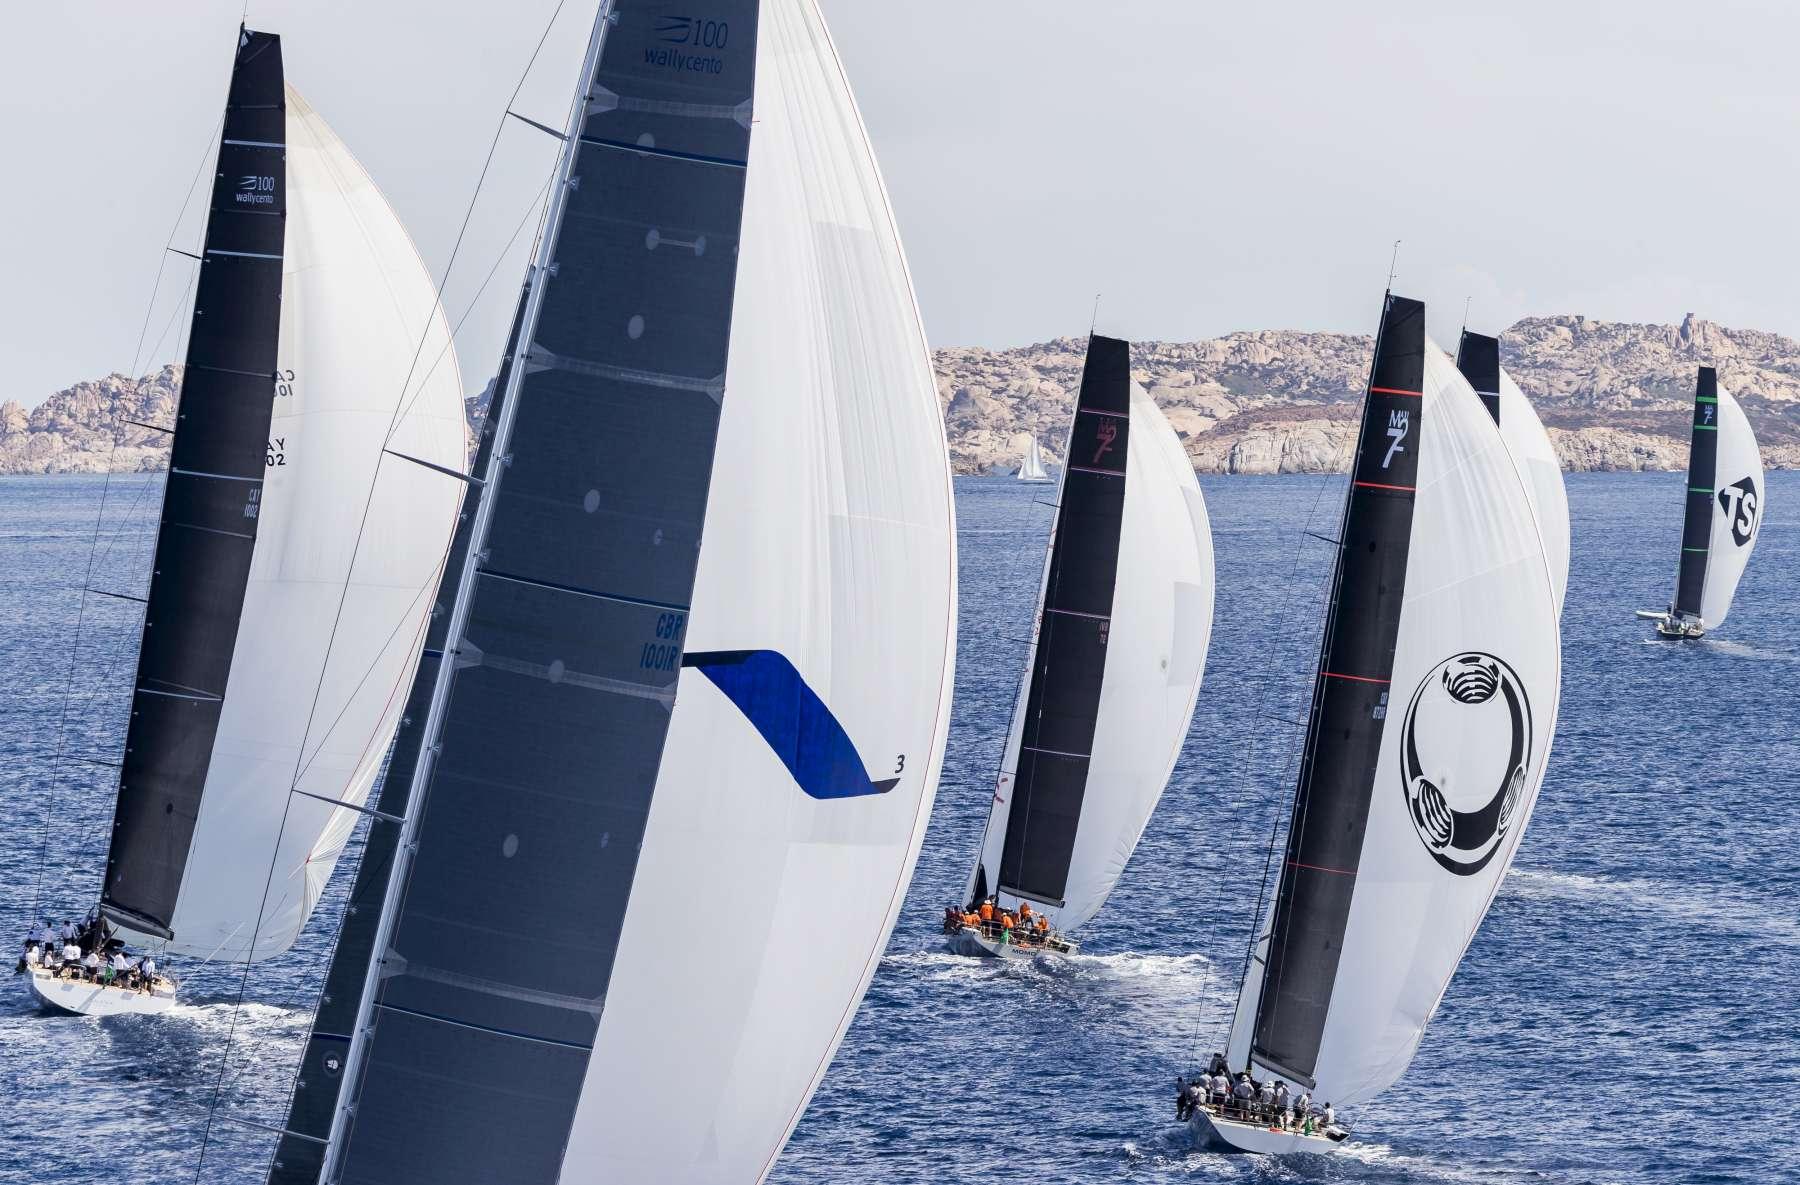 Maxi Yacht Rolex Cup: una partenza a gonfie vele - NEWS - Yacht Club Costa Smeralda